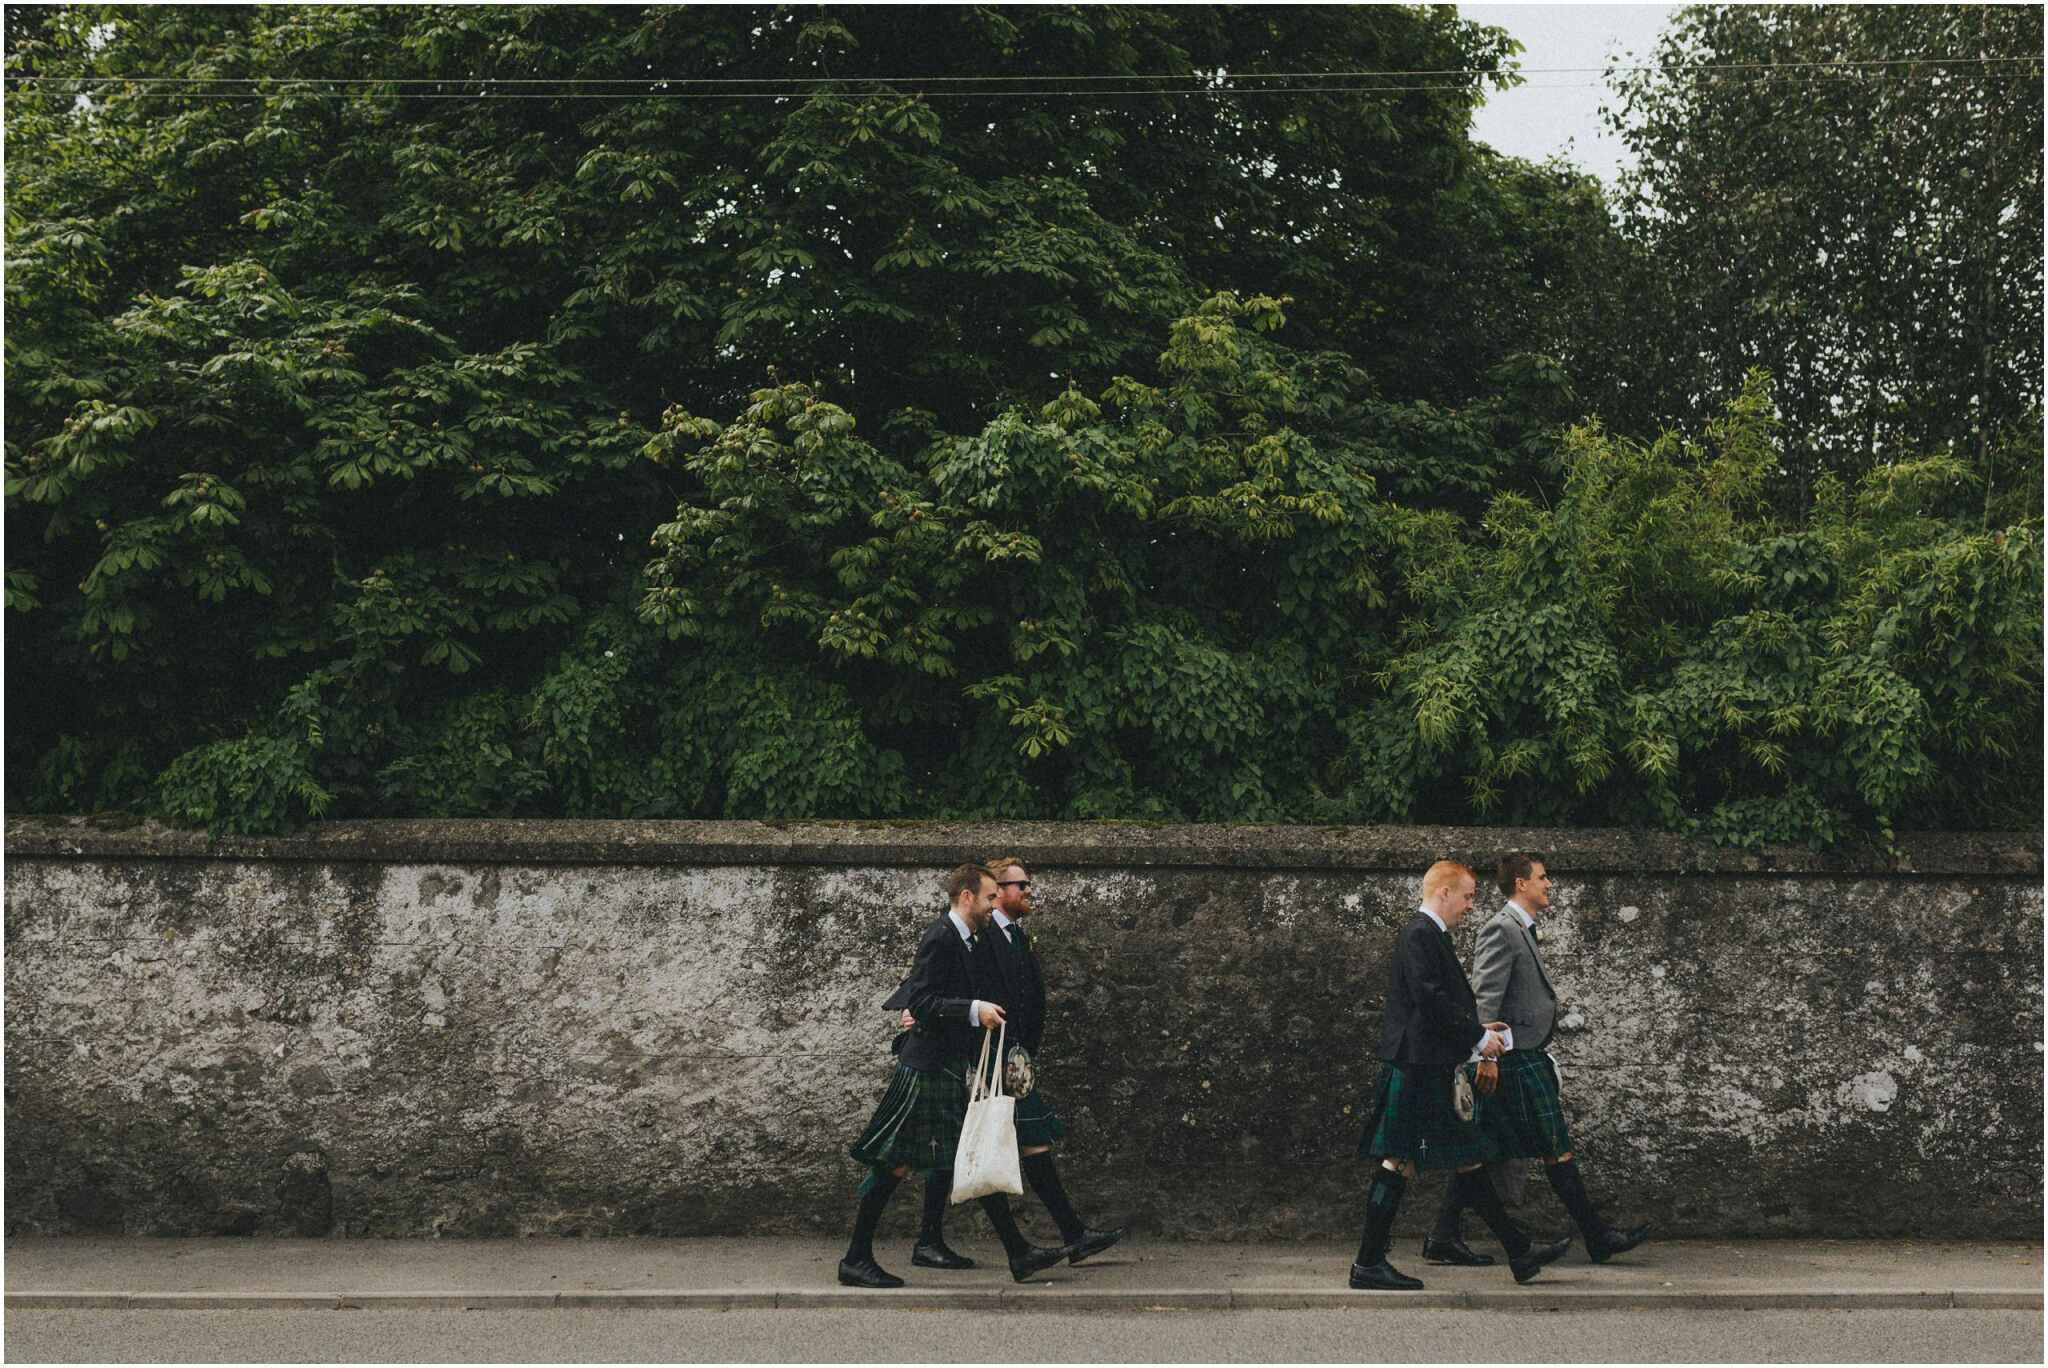 Fionnuala + Paul - Mount Druid Alternative Wedding 44